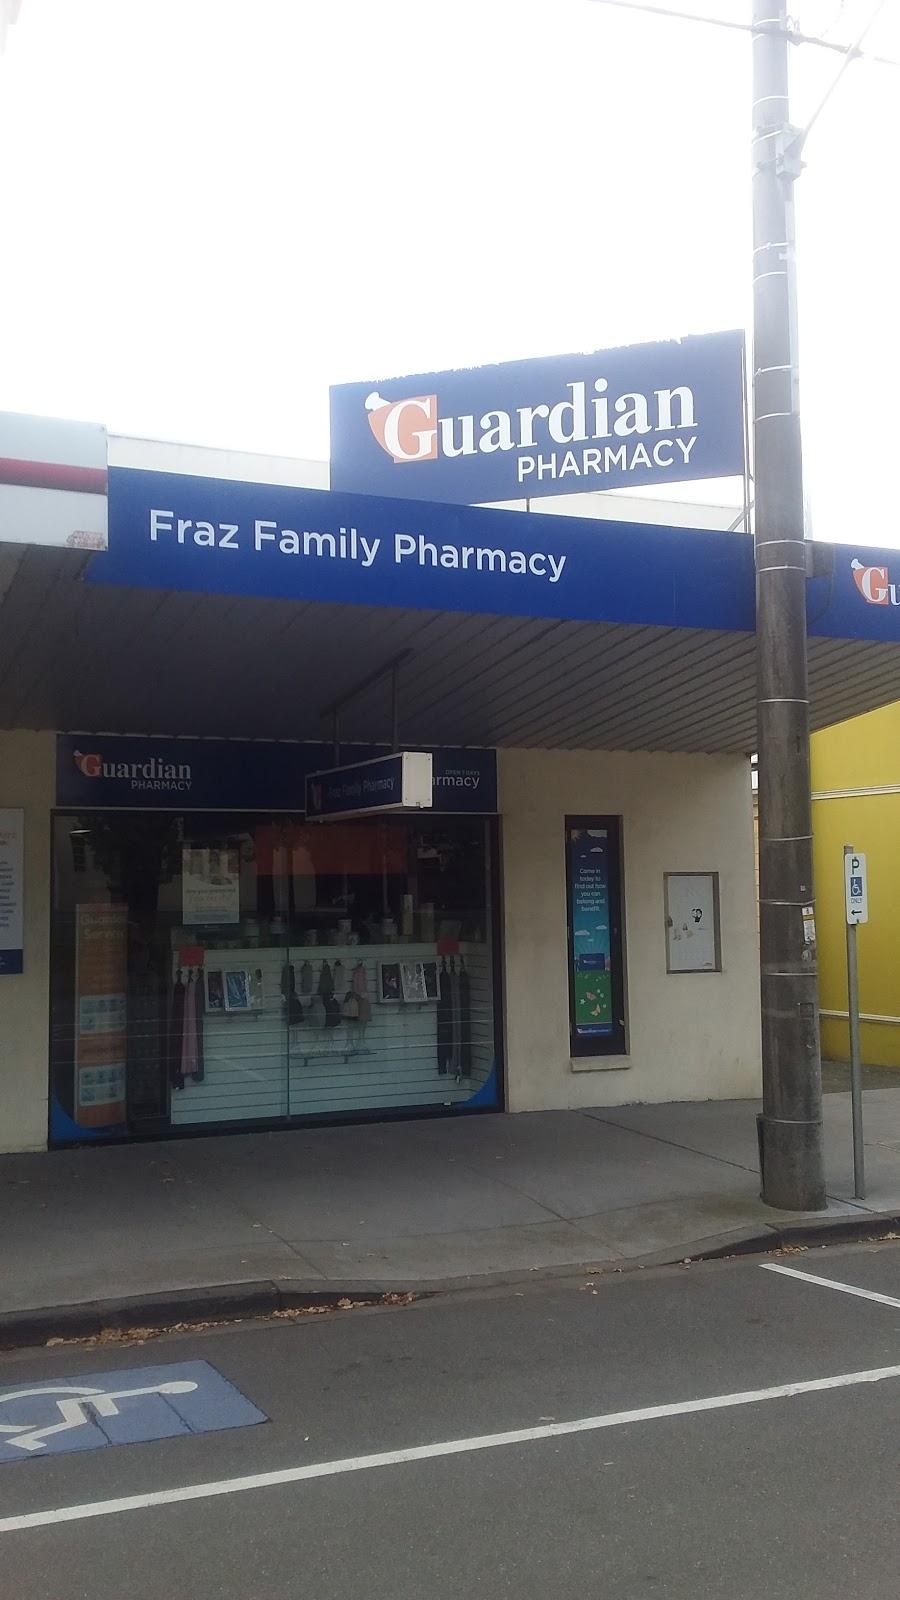 Guardian Pharmacy Terang - Fraz Family | health | 68-70 High St, Terang VIC 3264, Australia | 0355921253 OR +61 3 5592 1253